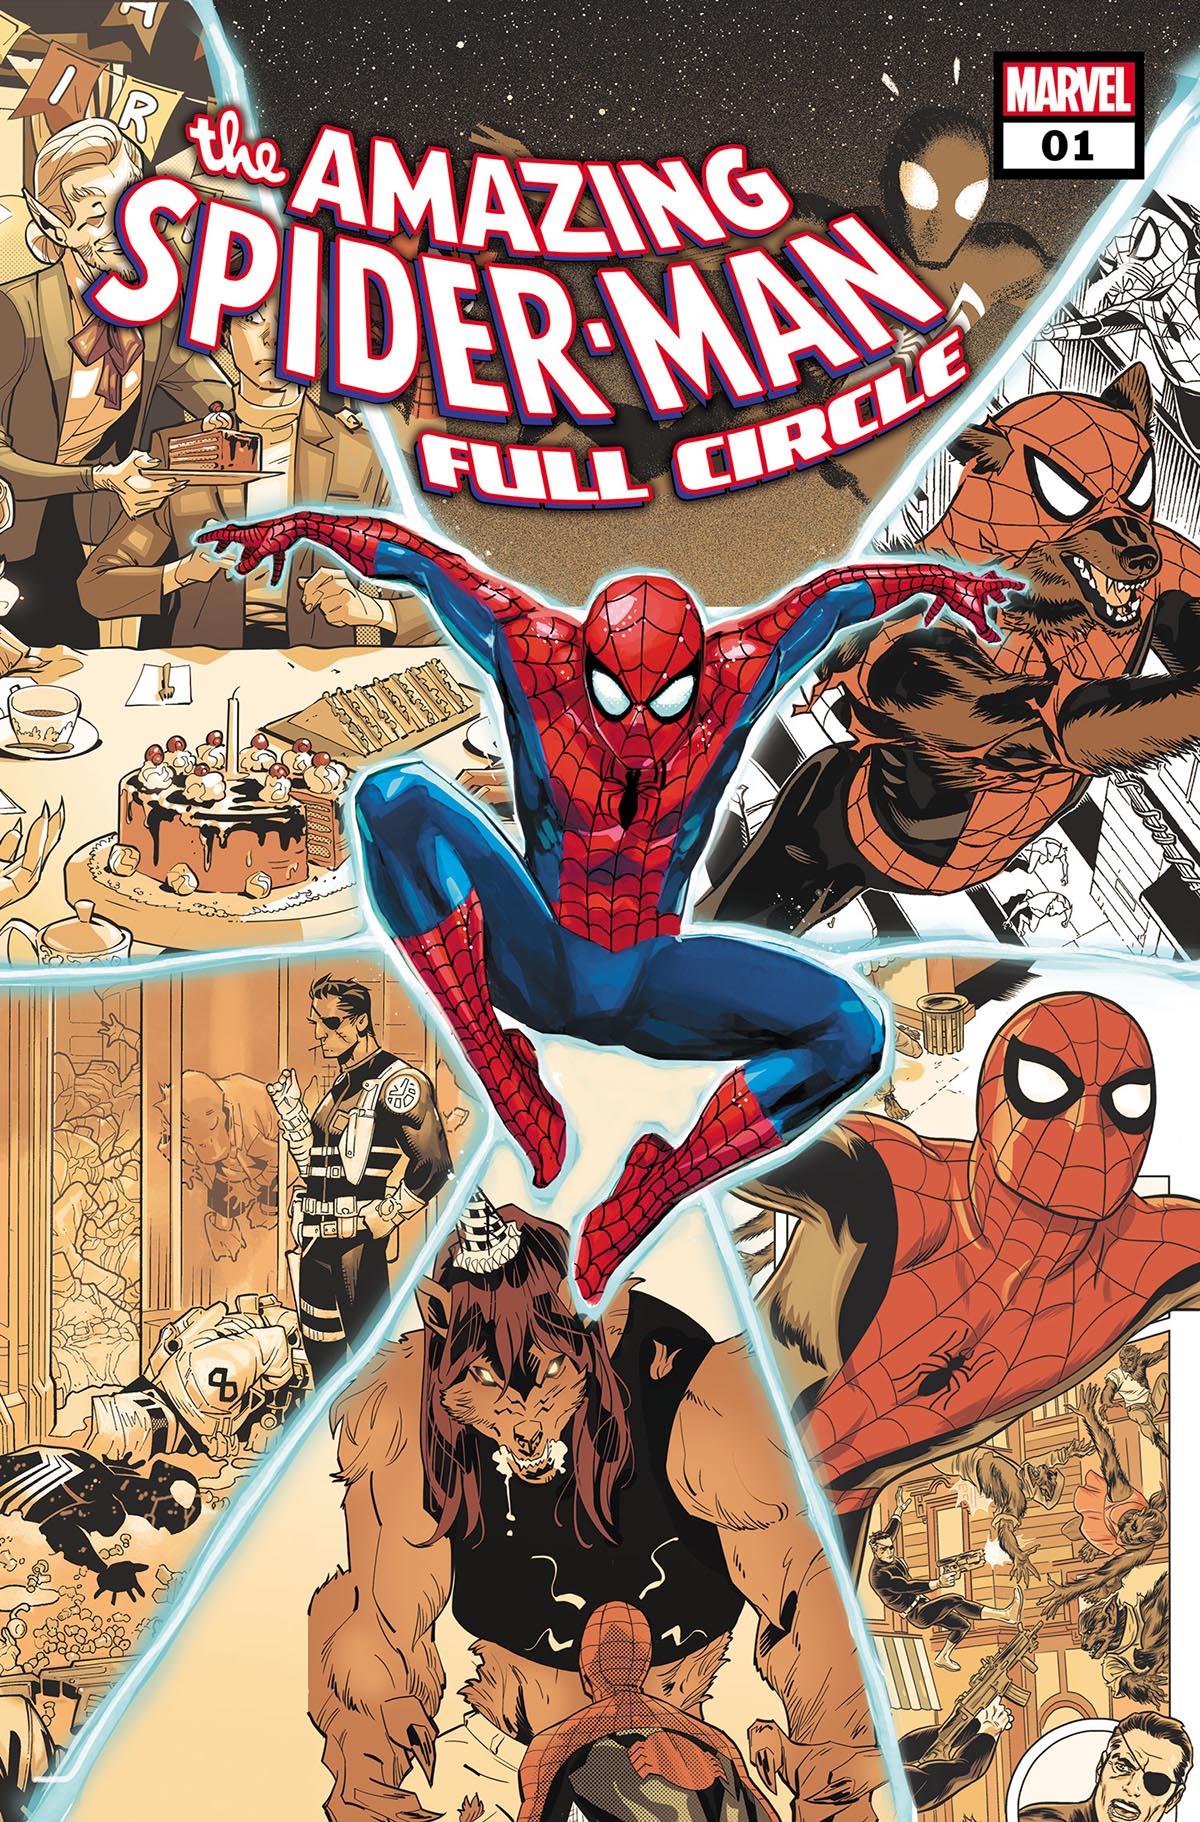 The Amazing Spider-Man: Full Circle #1